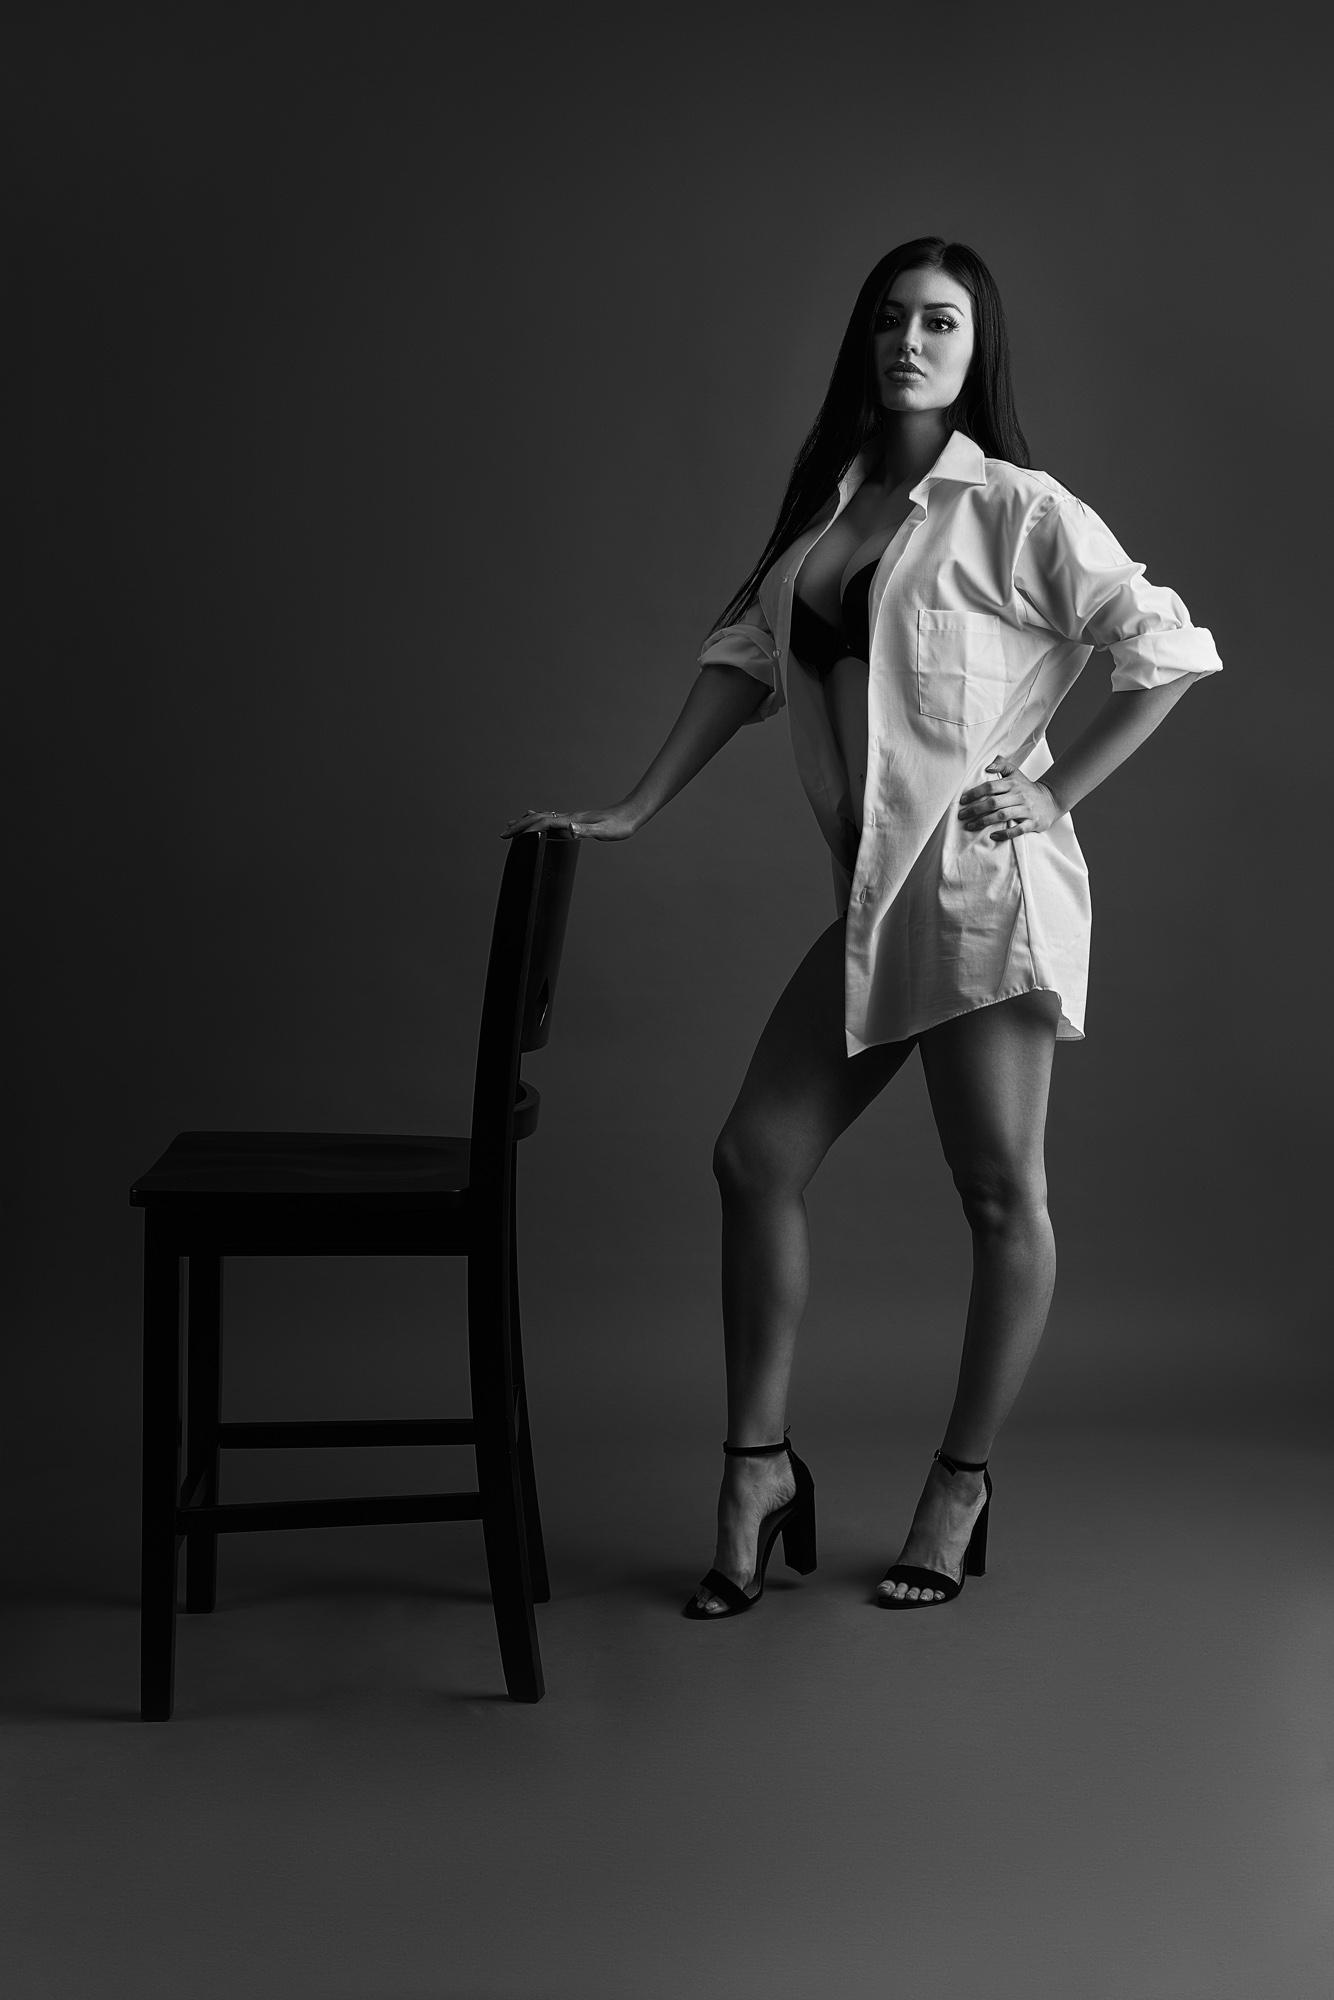 Veronica Glamour Model by Mesa Arizona Fashion Portrait Photographer Chad Weed